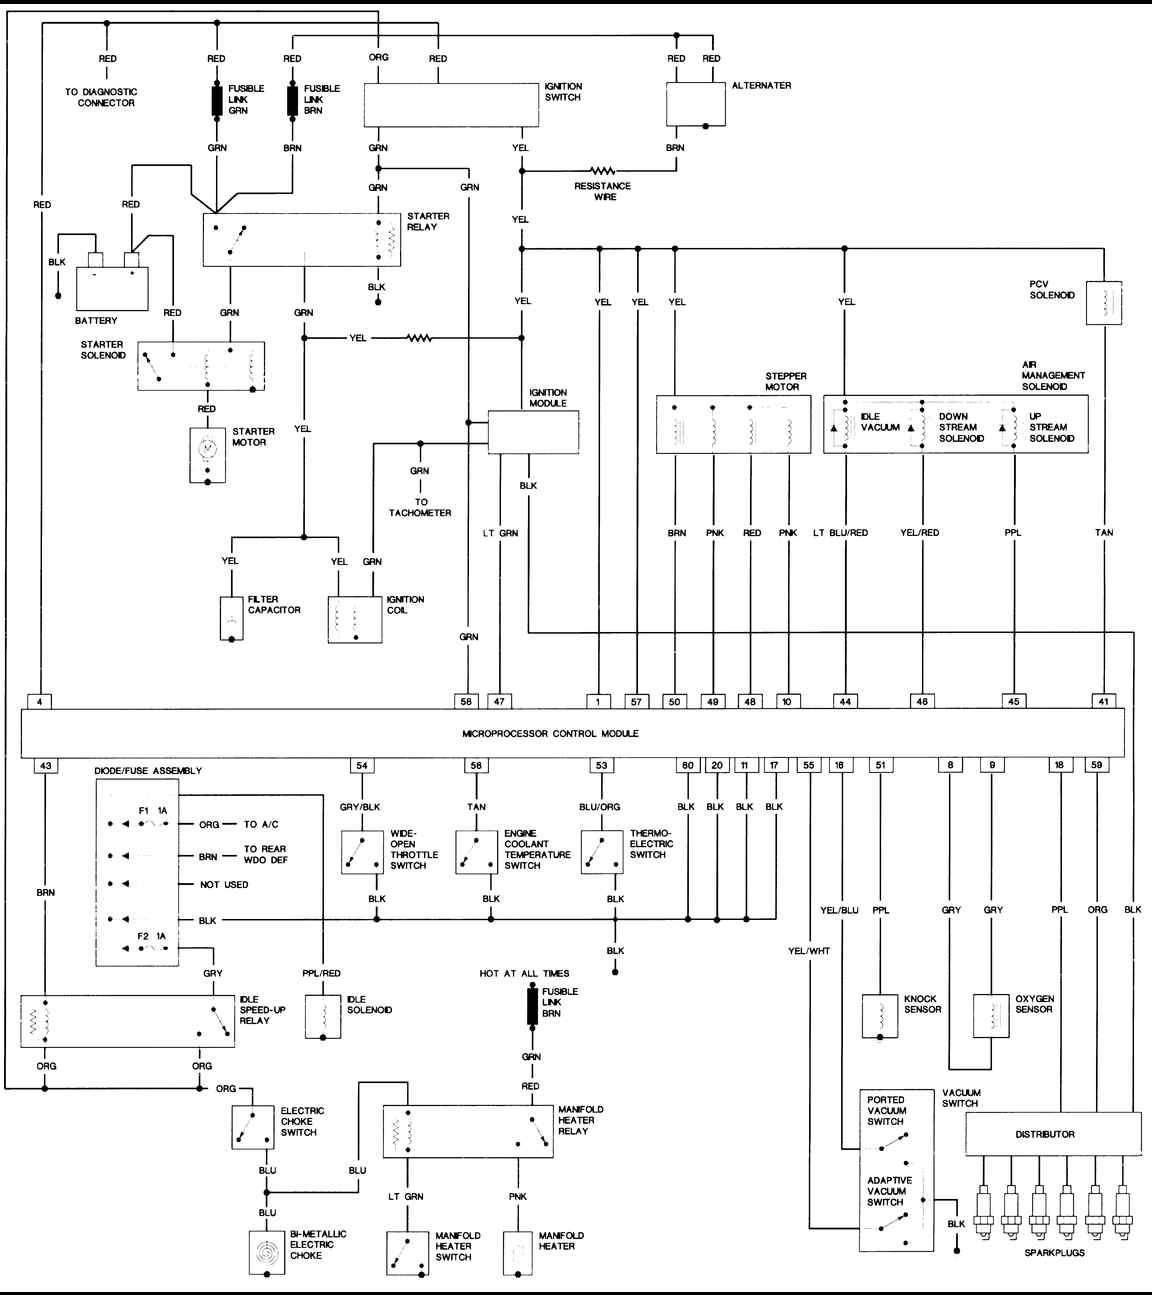 Fine Ford 1997 4 2L Engine Diagram Basic Electronics Wiring Diagram Wiring Cloud Staixaidewilluminateatxorg